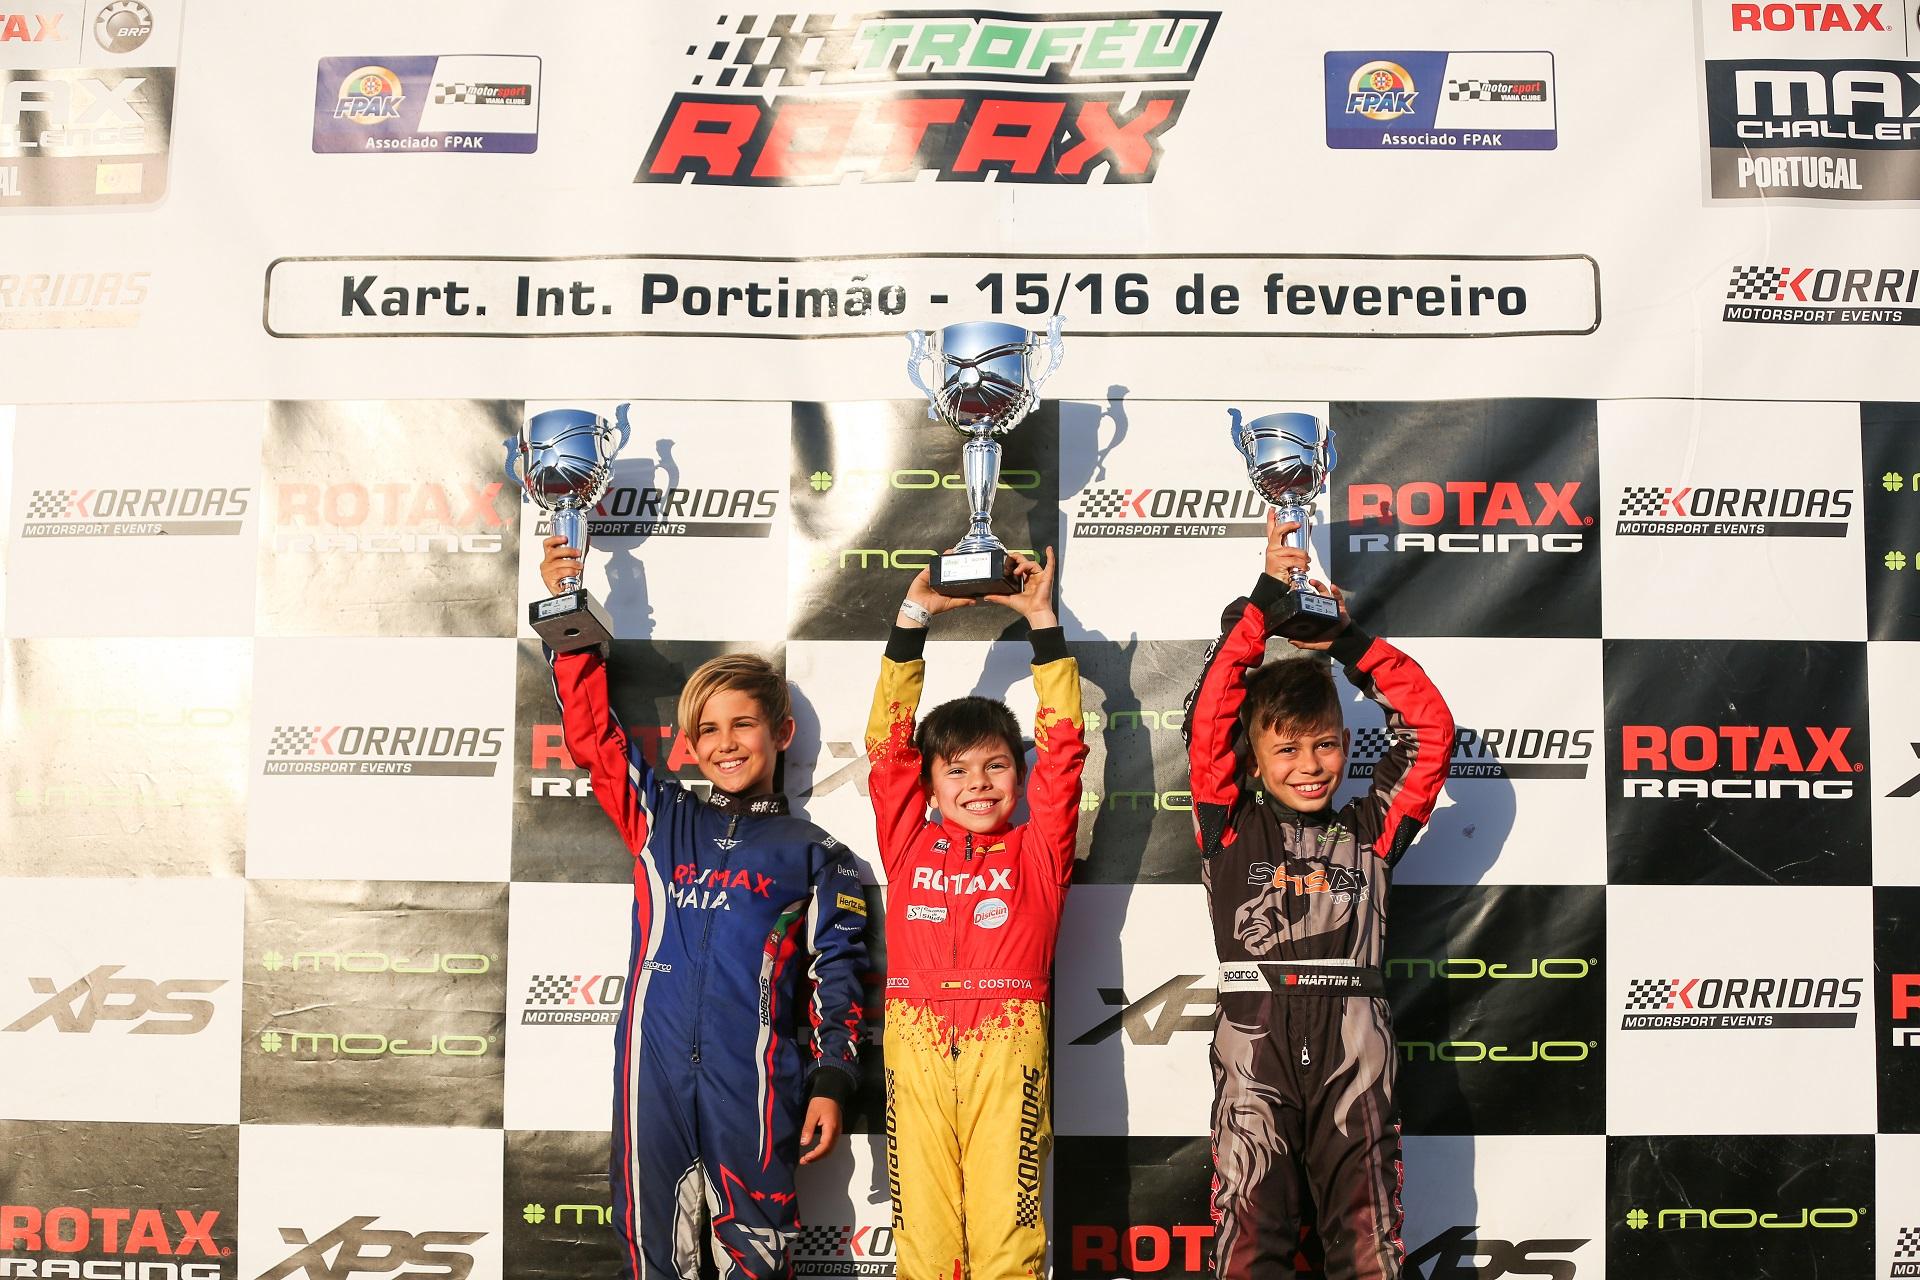 Christian Costoya sigue siendo el piloto a batir en el Trofeu Rotax de Portugal